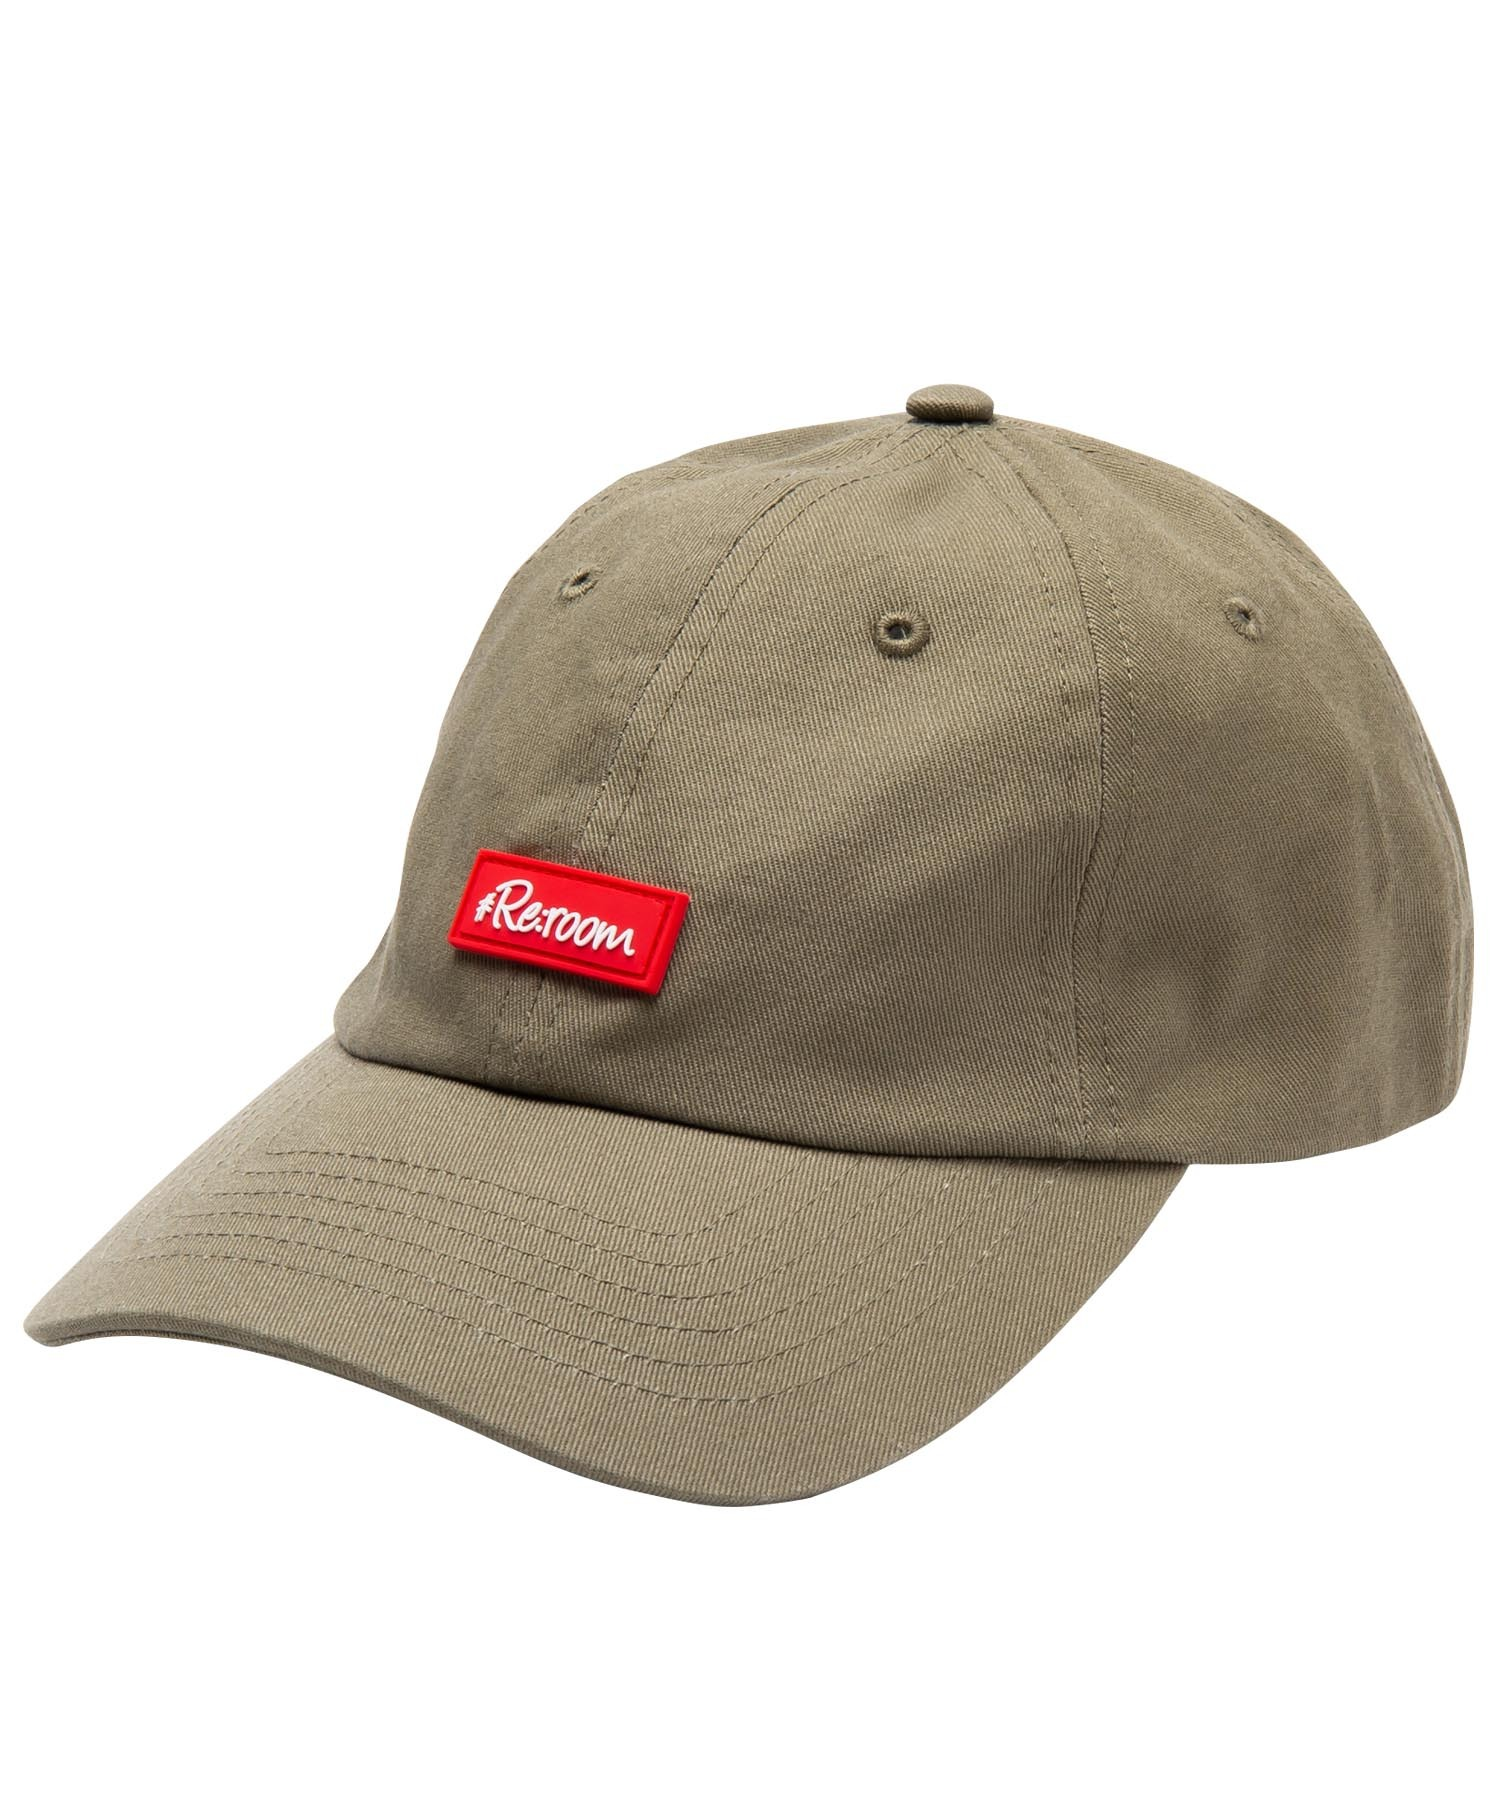 RUBBER LOGO TWILL CAP[REH086]